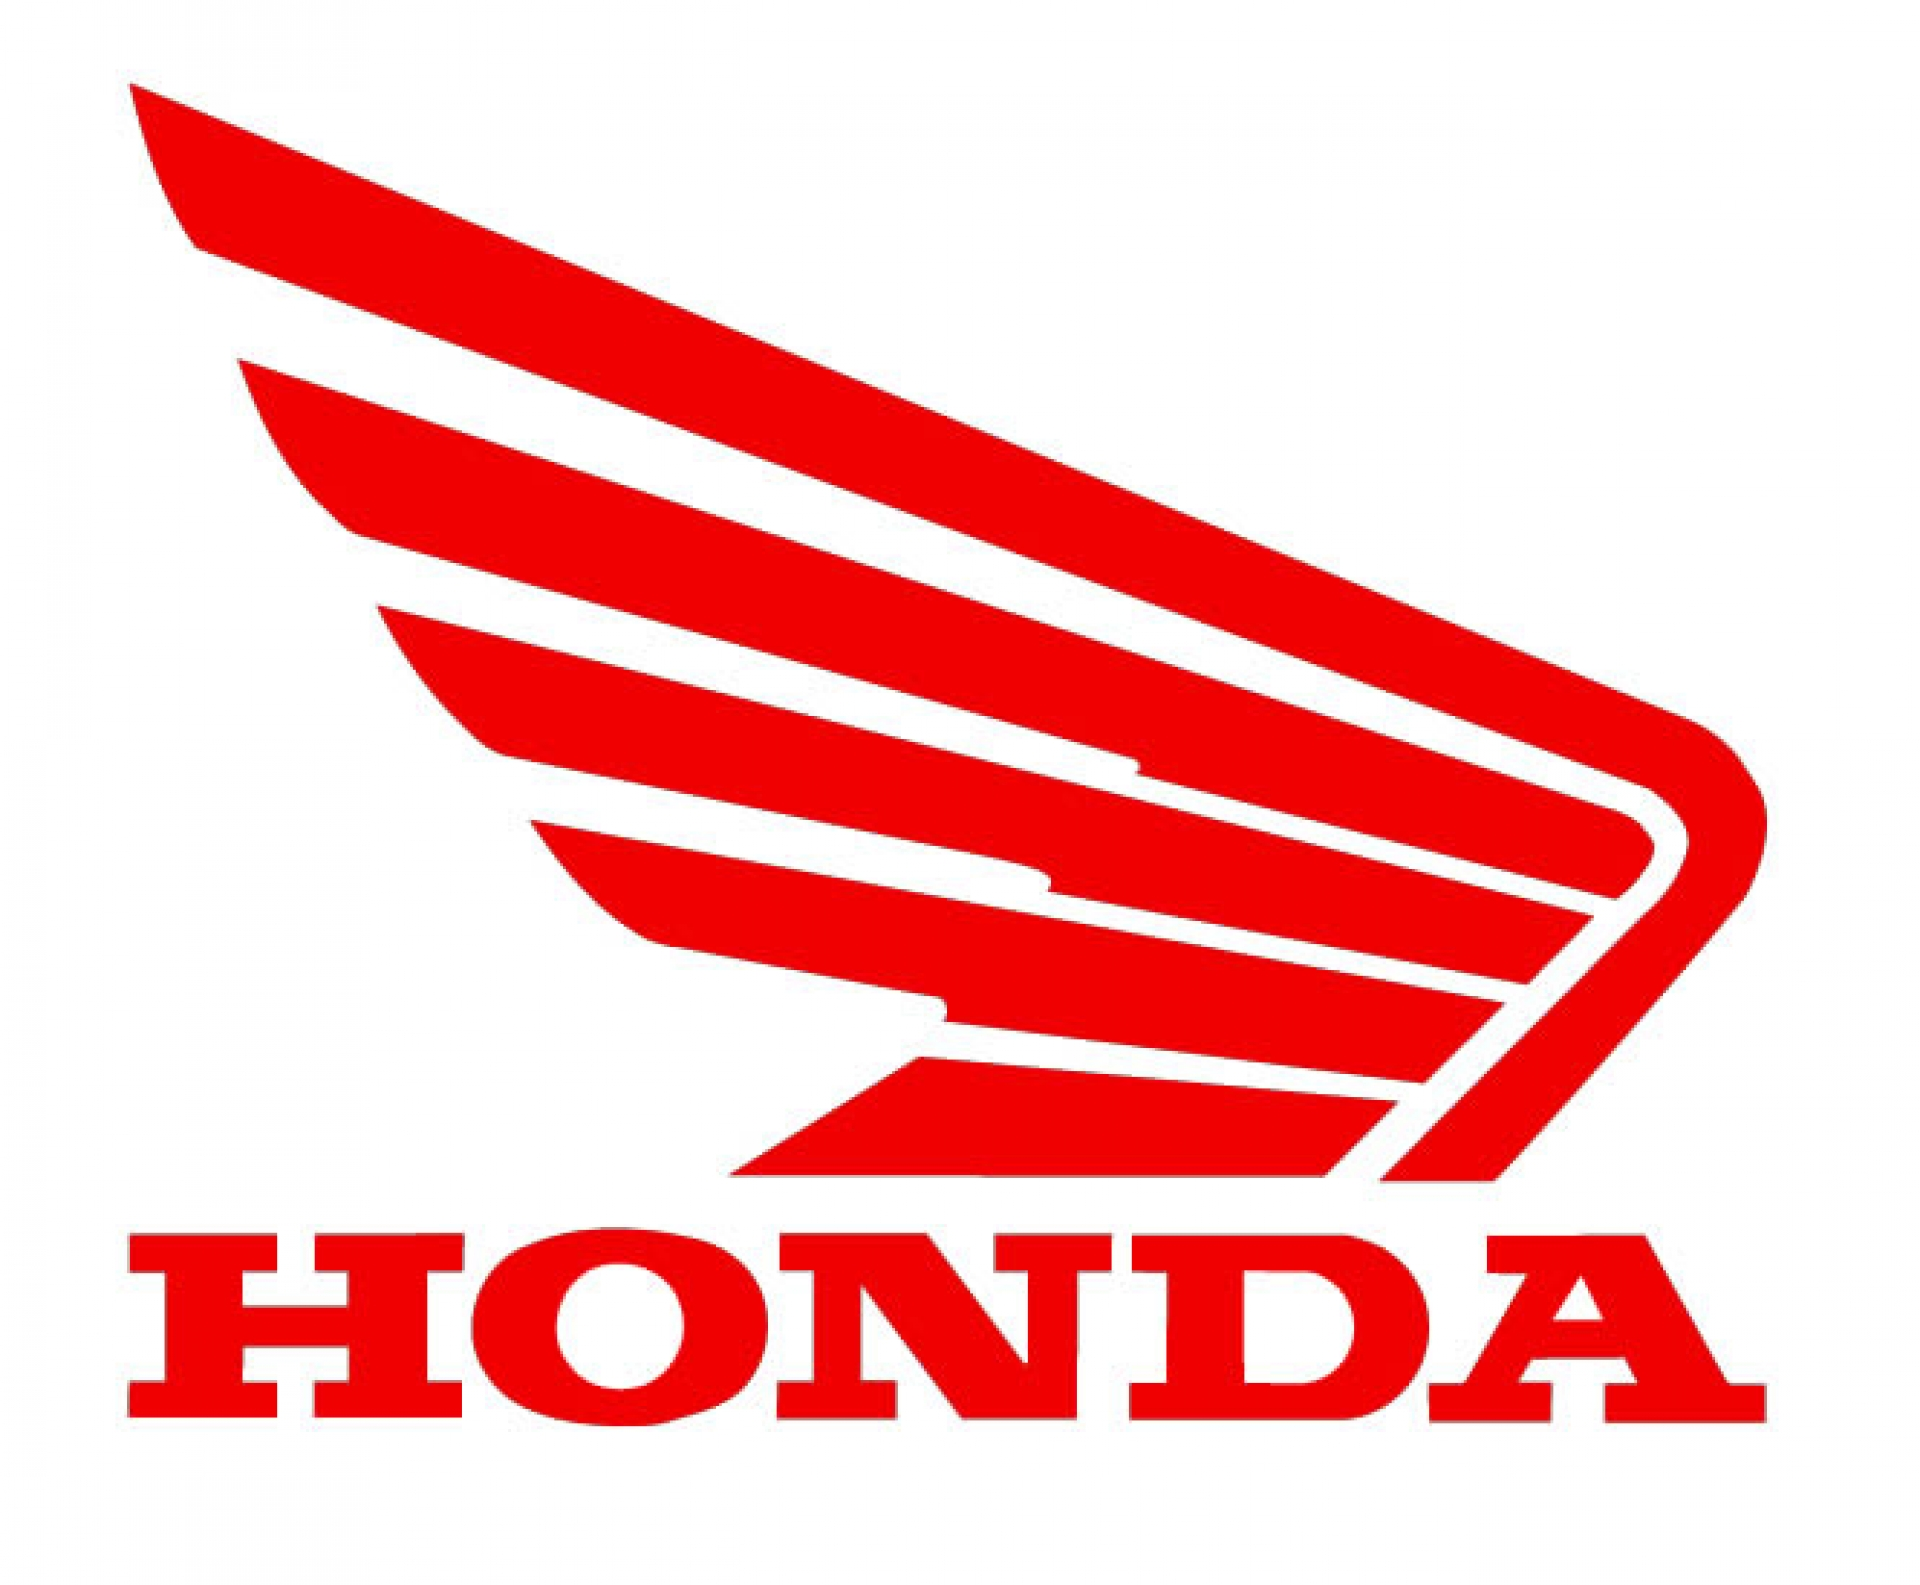 Honda Wings PNG - 111227